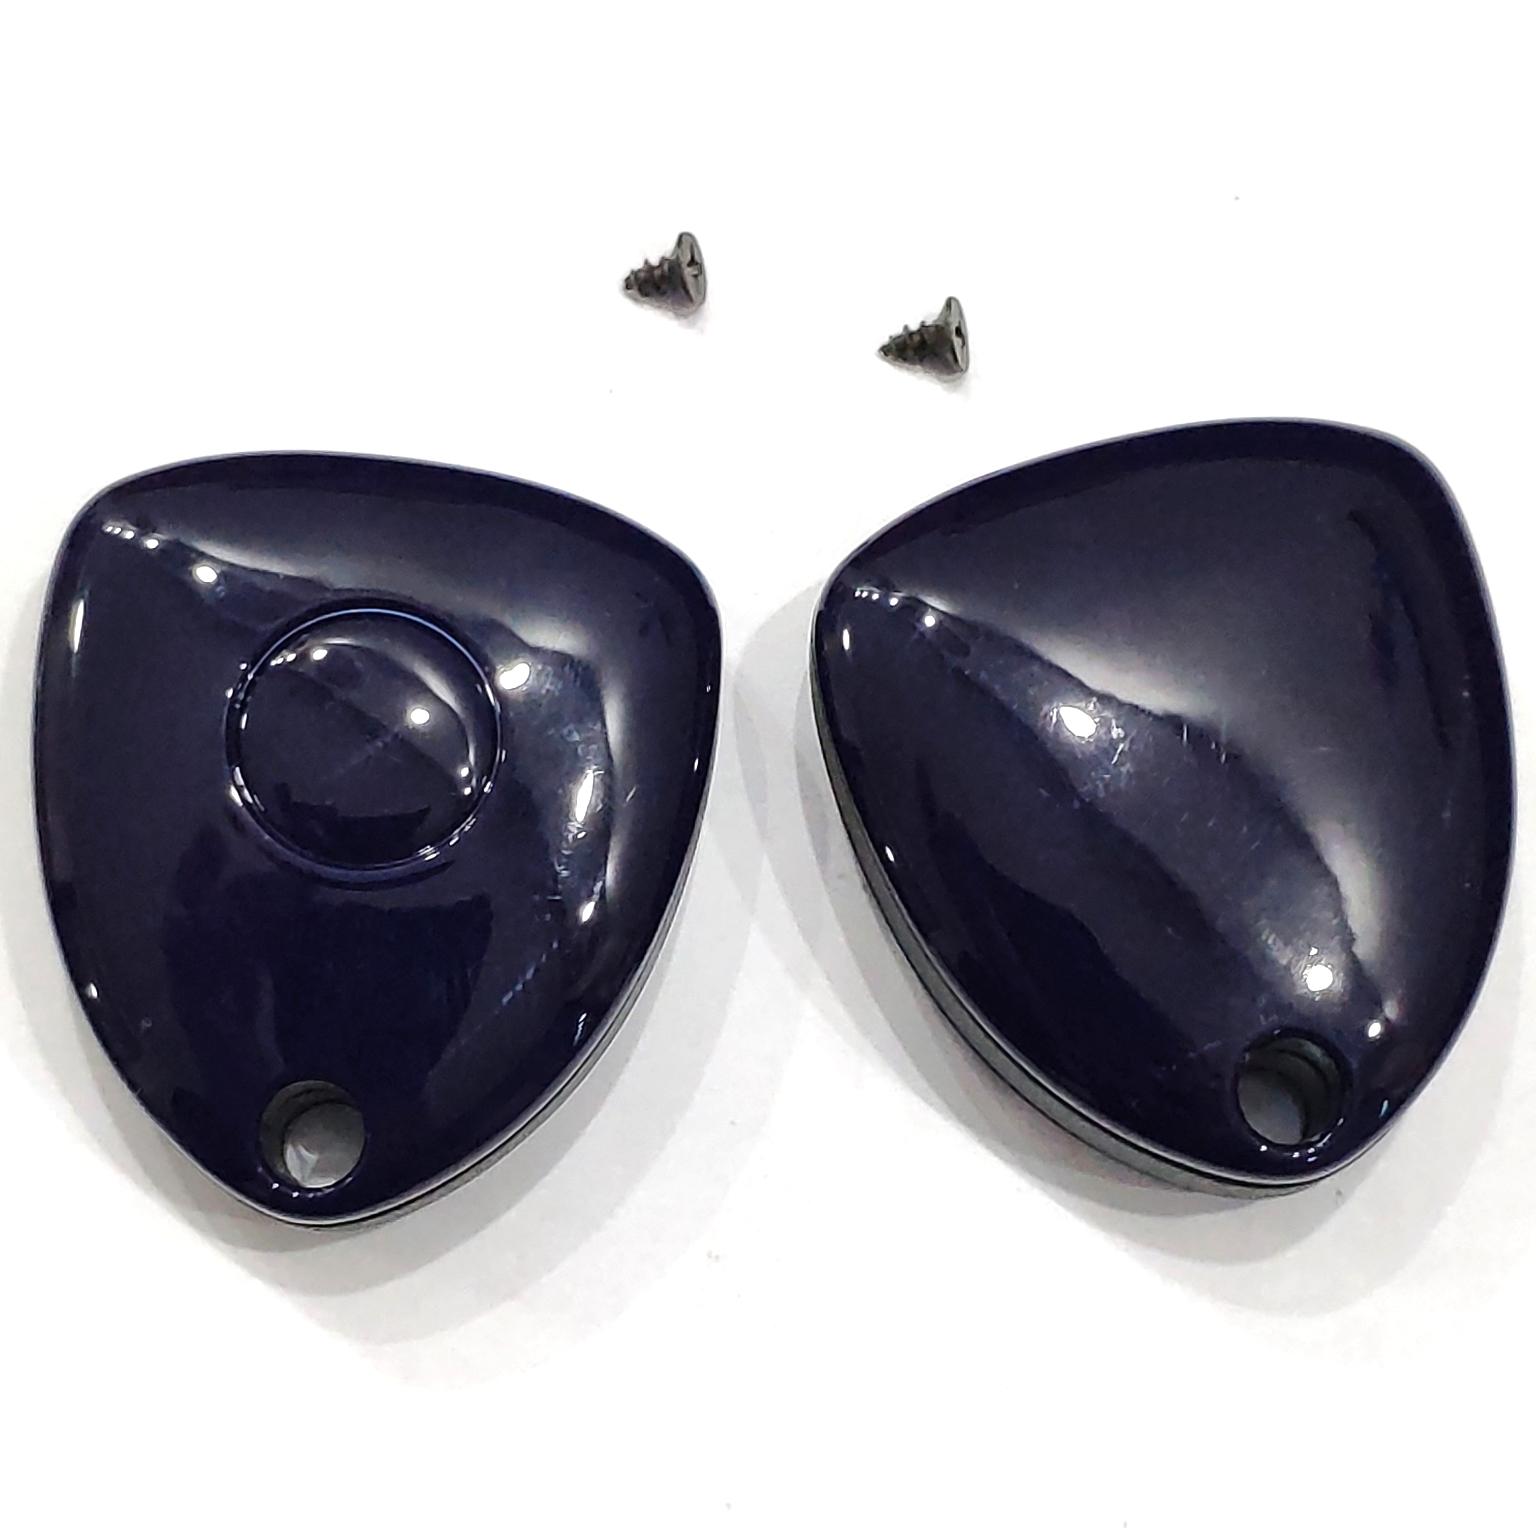 Universal Key Shells Type 12 - 5 pcs/lot